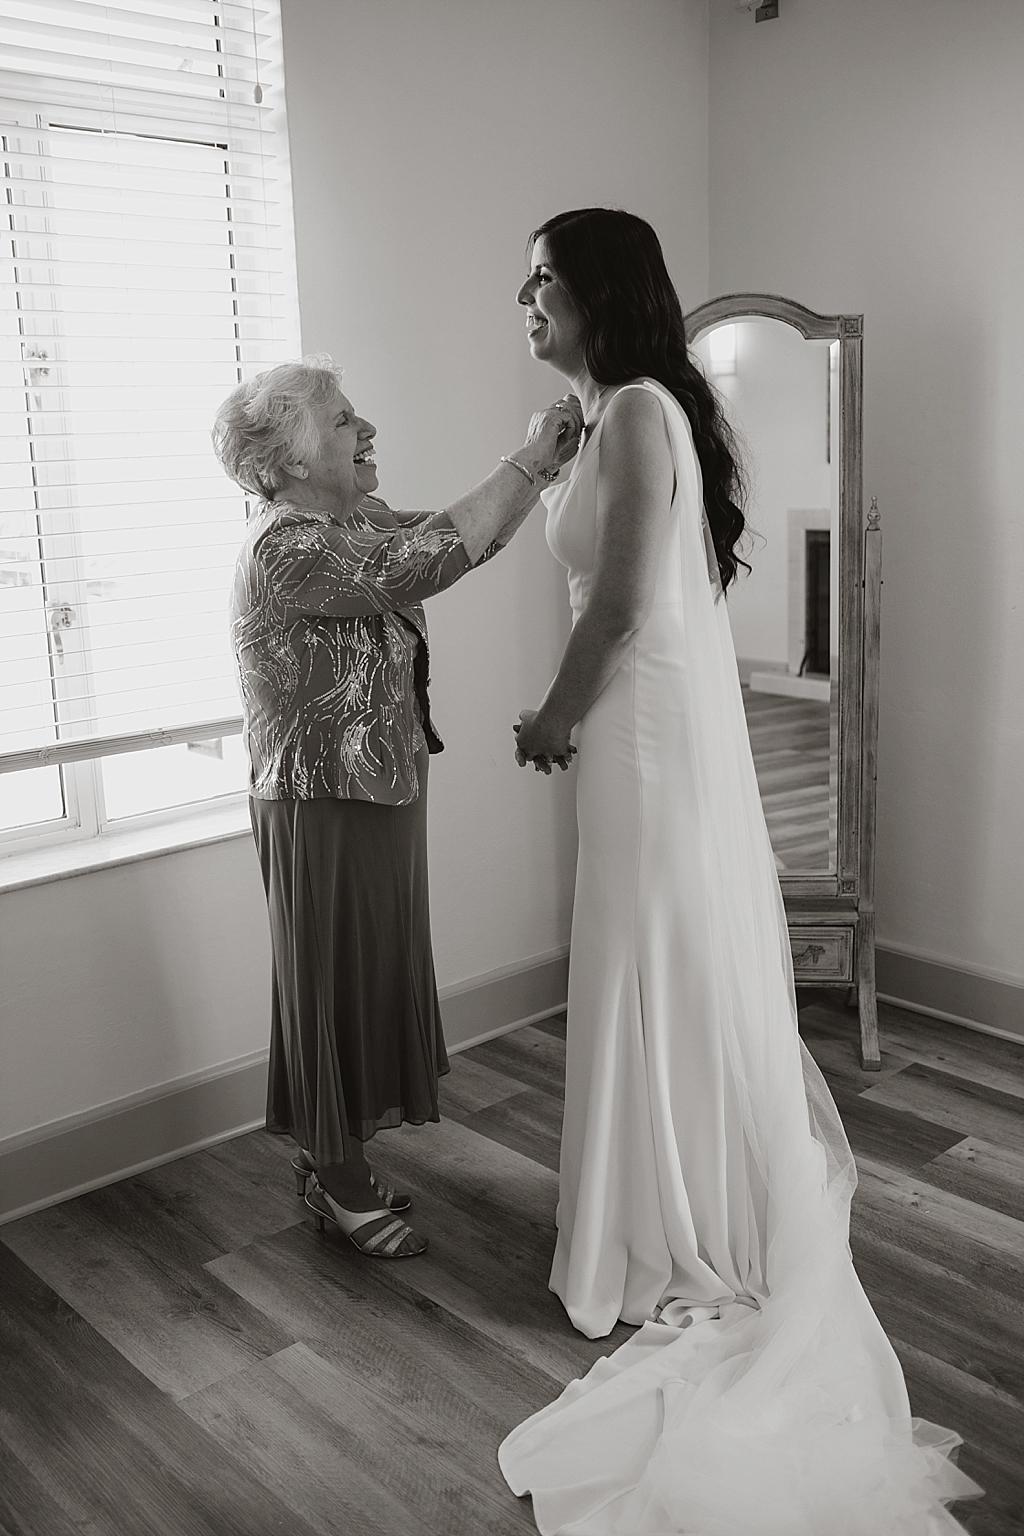 grandma helping bride with jewelry